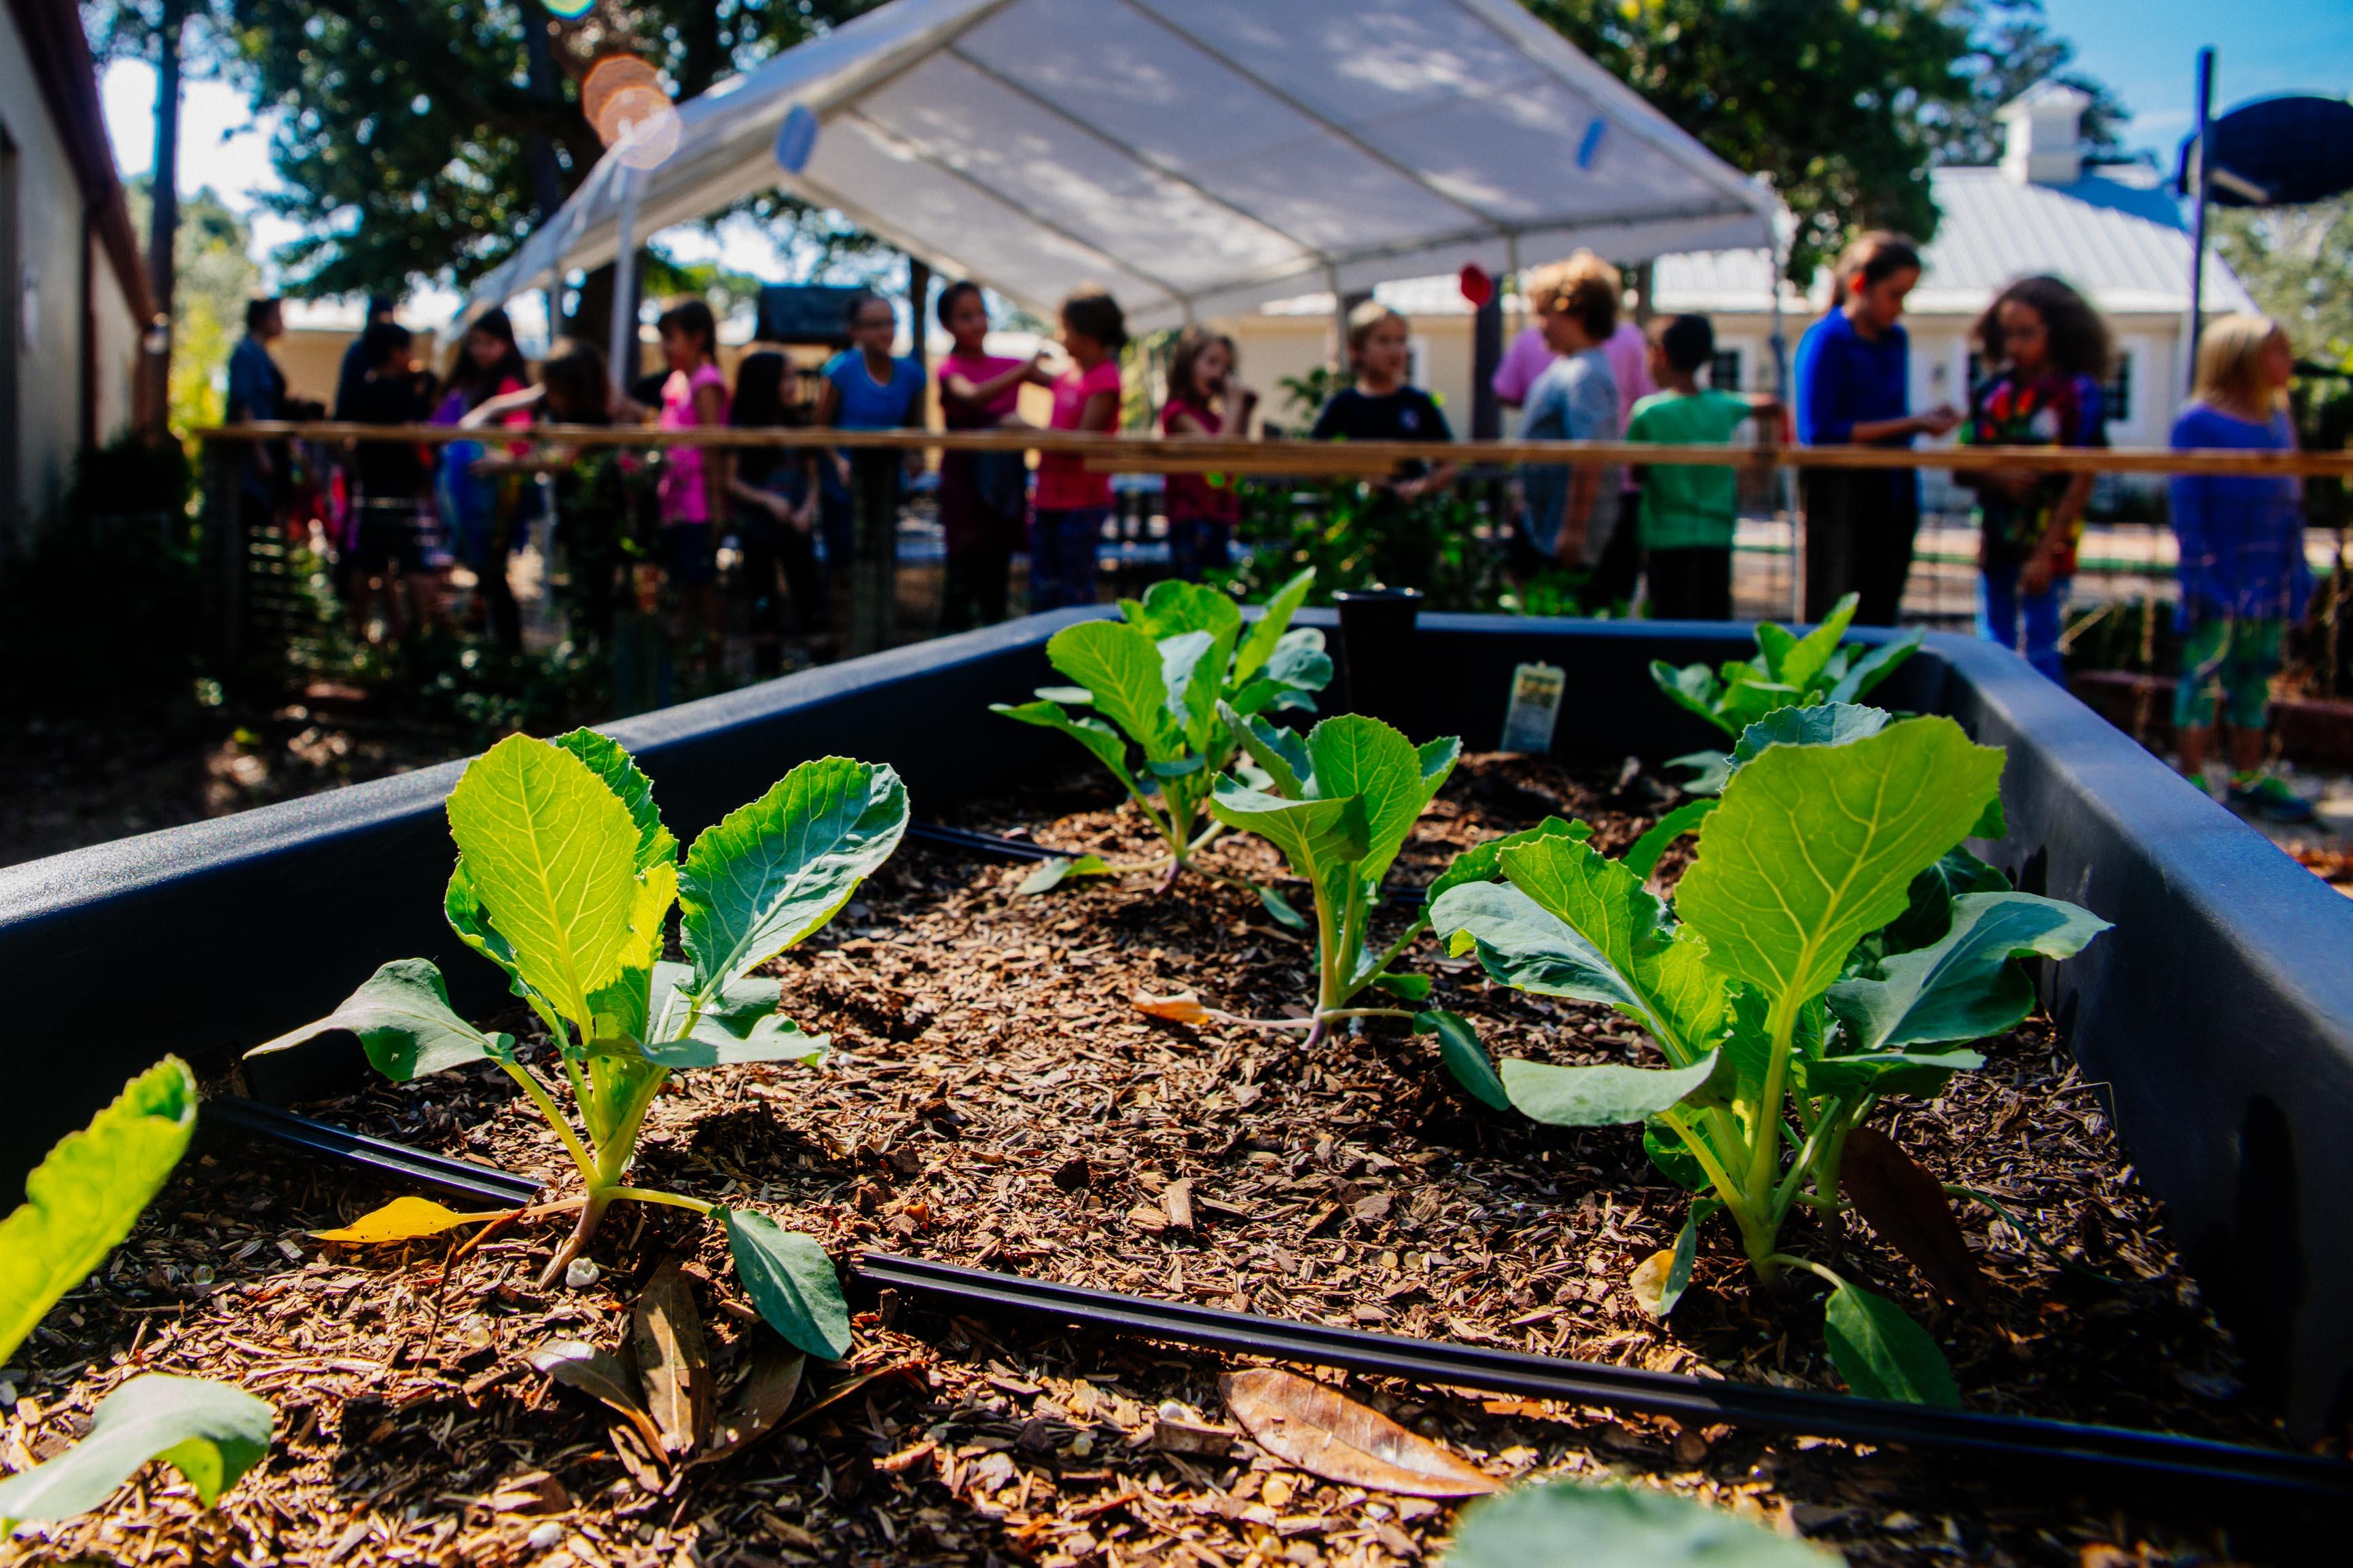 Elementary students overlooking MSP's Montessori Drive Campus garden